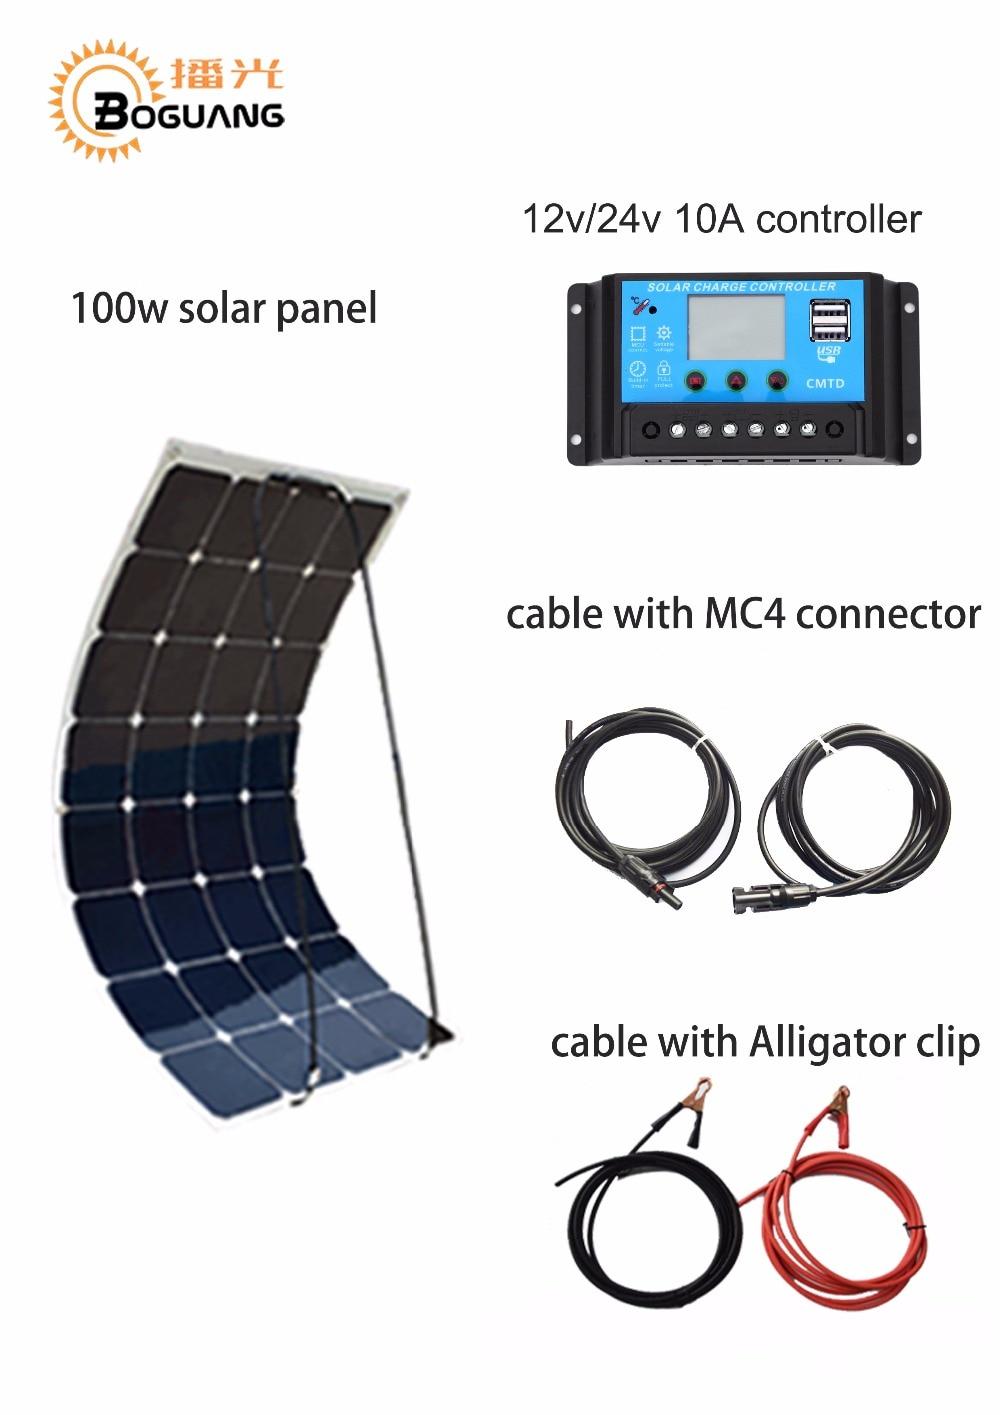 BOGUANG 100 Watt DIY Solar System Kit 100 Watt PV flexible solar ...